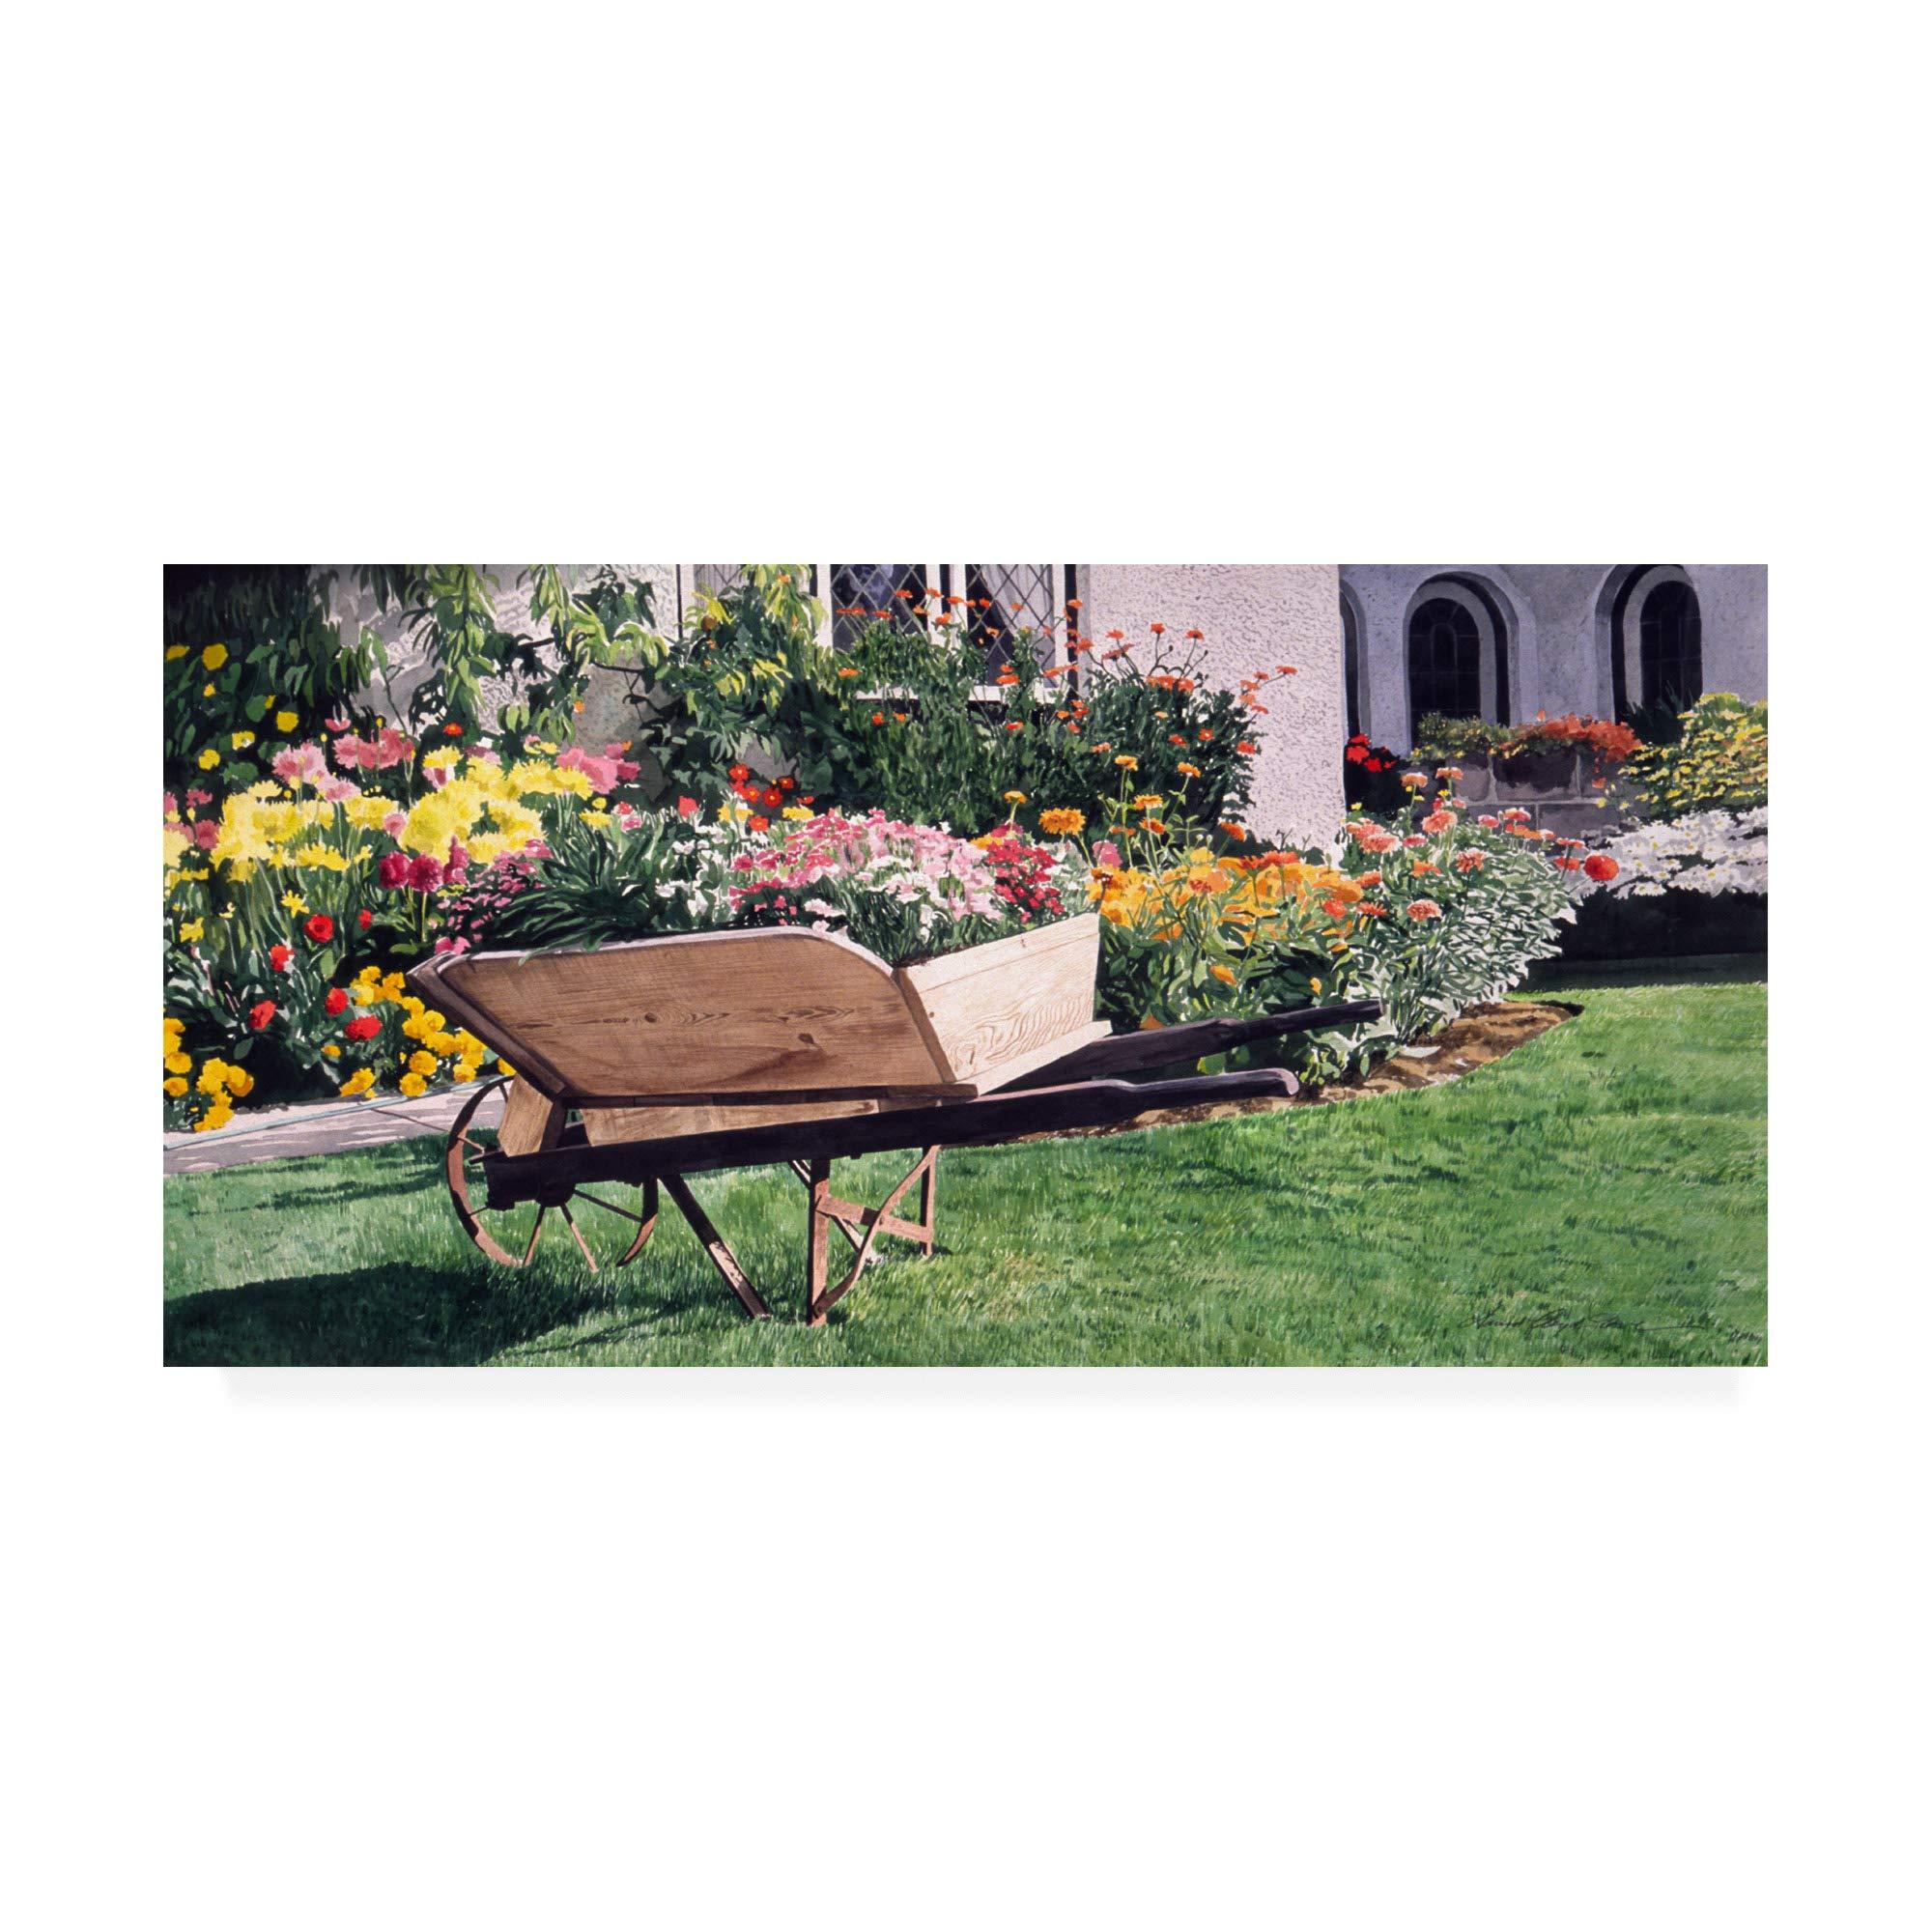 Trademark Fine Art The The Gardeners Wheelbarrow by David Lloyd Glover, 12x24, Multiple